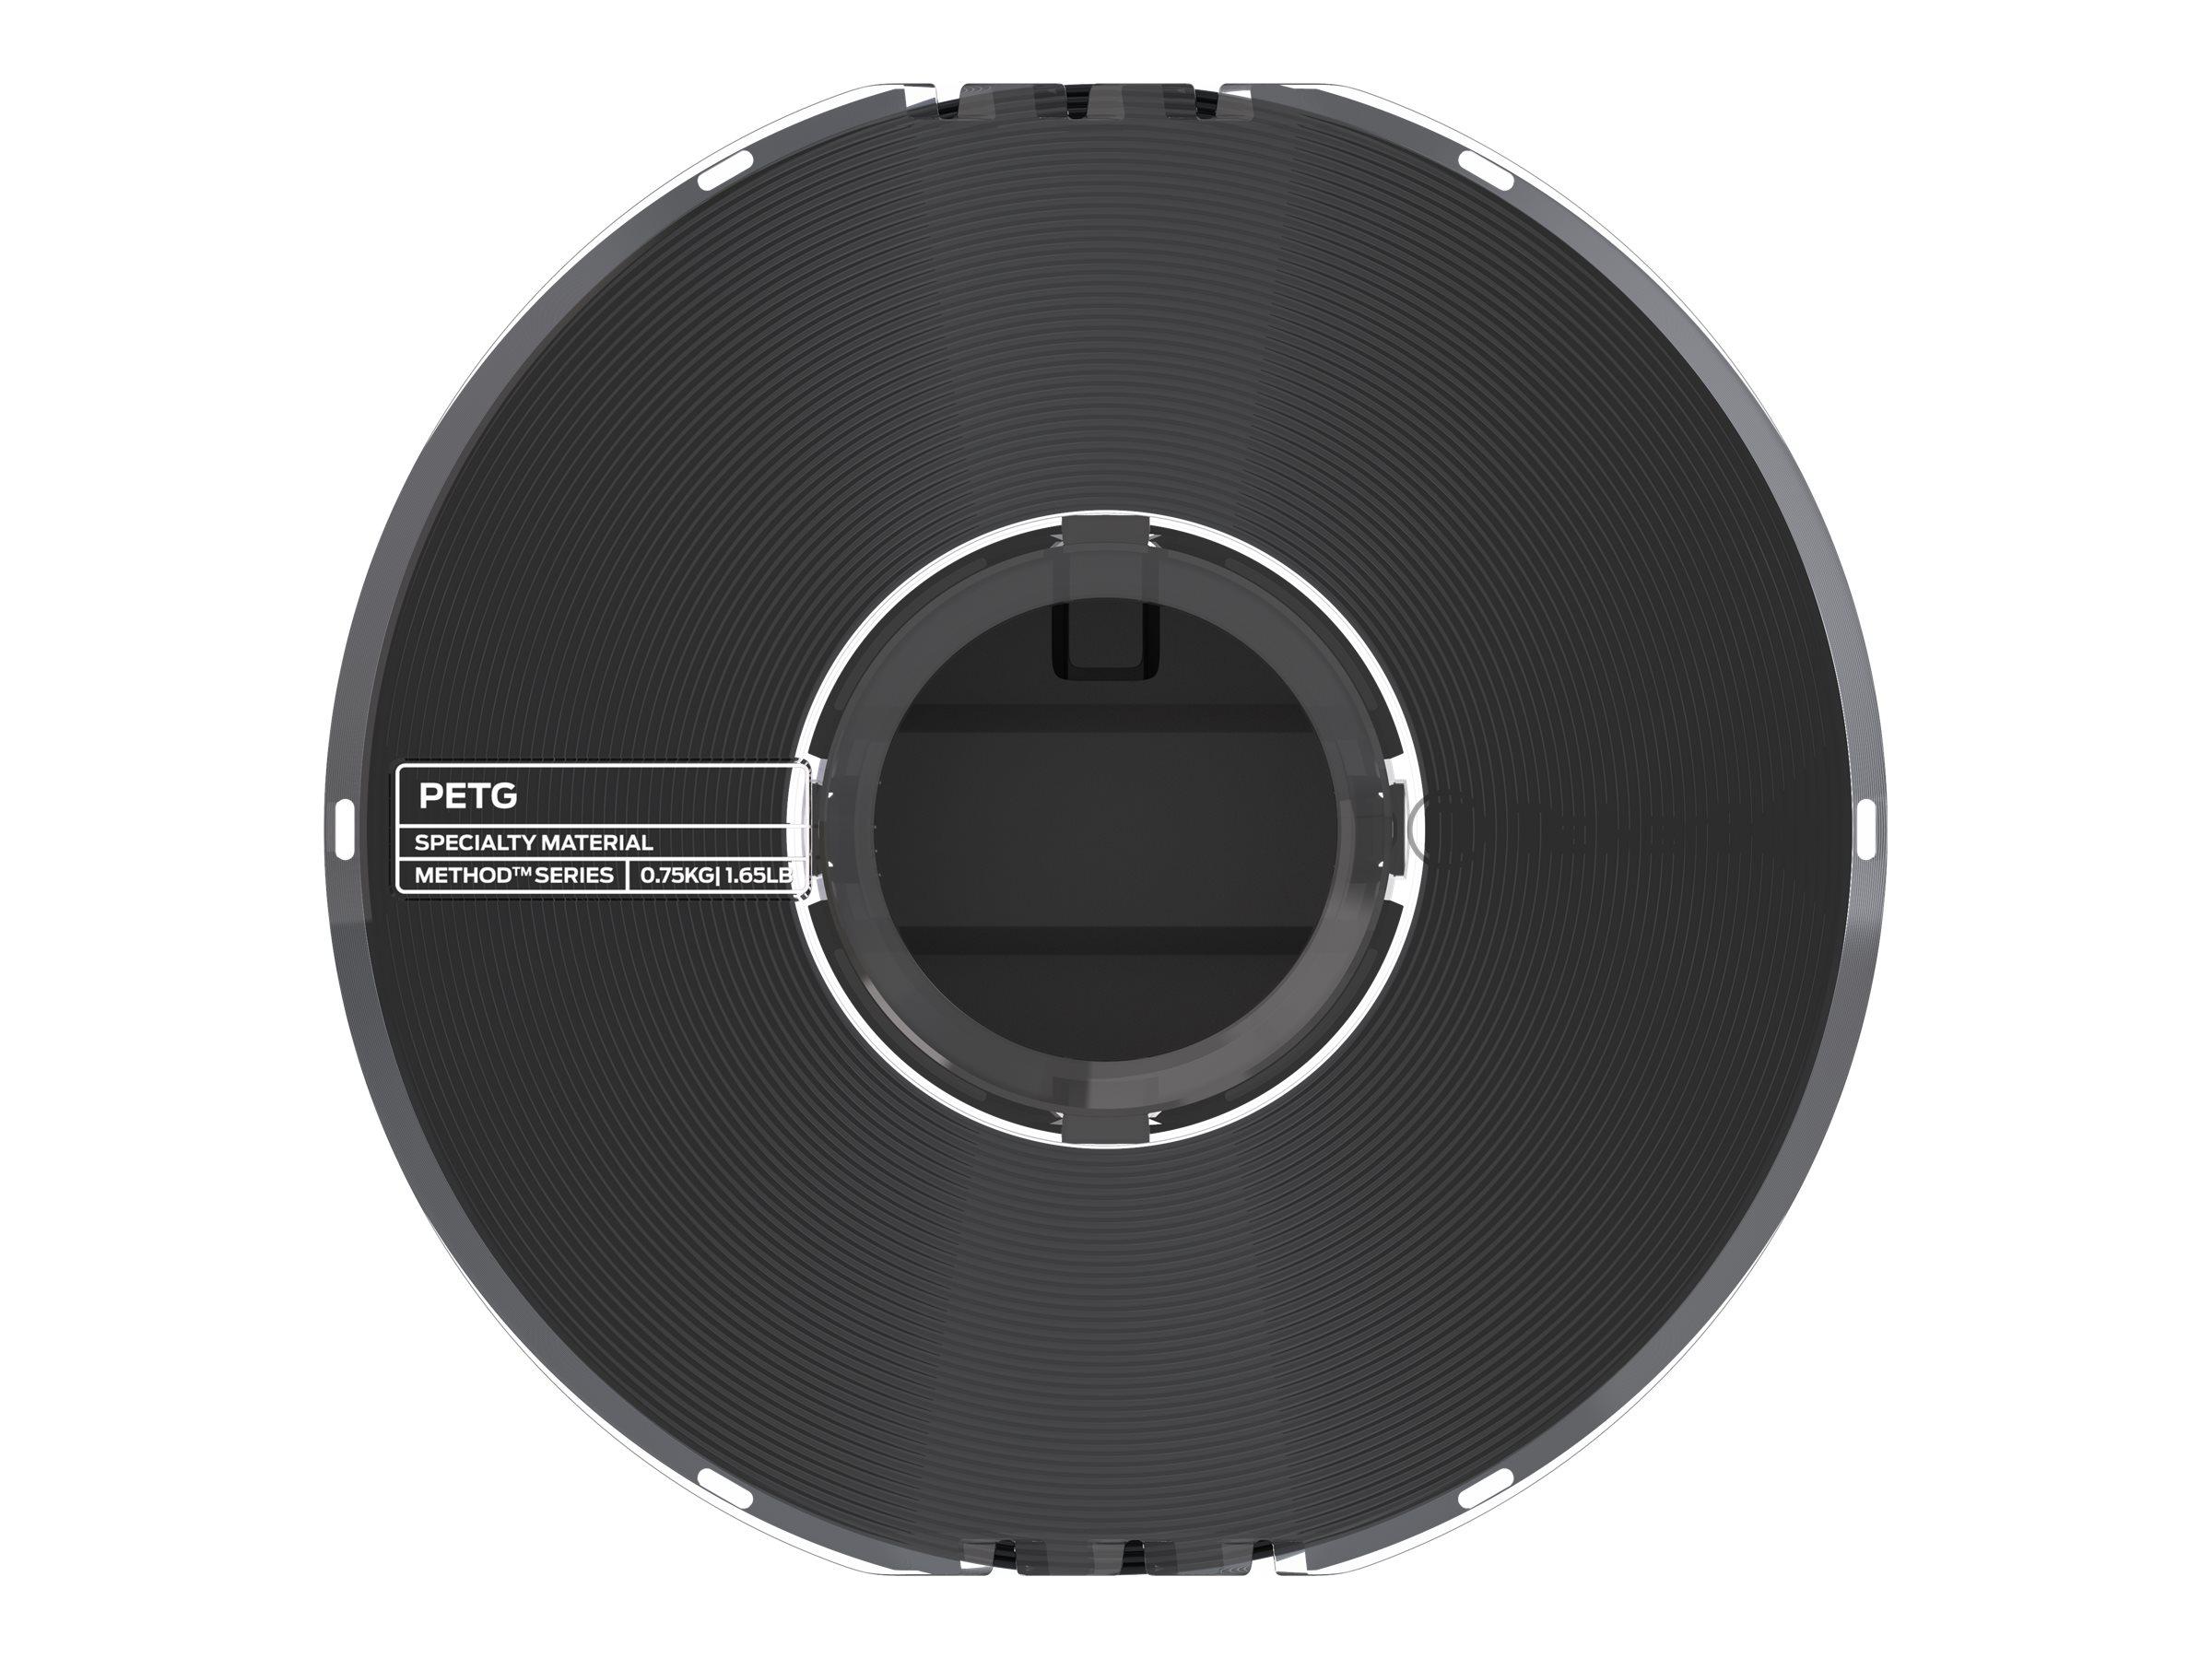 MakerBot Specialty - black - PETG filament